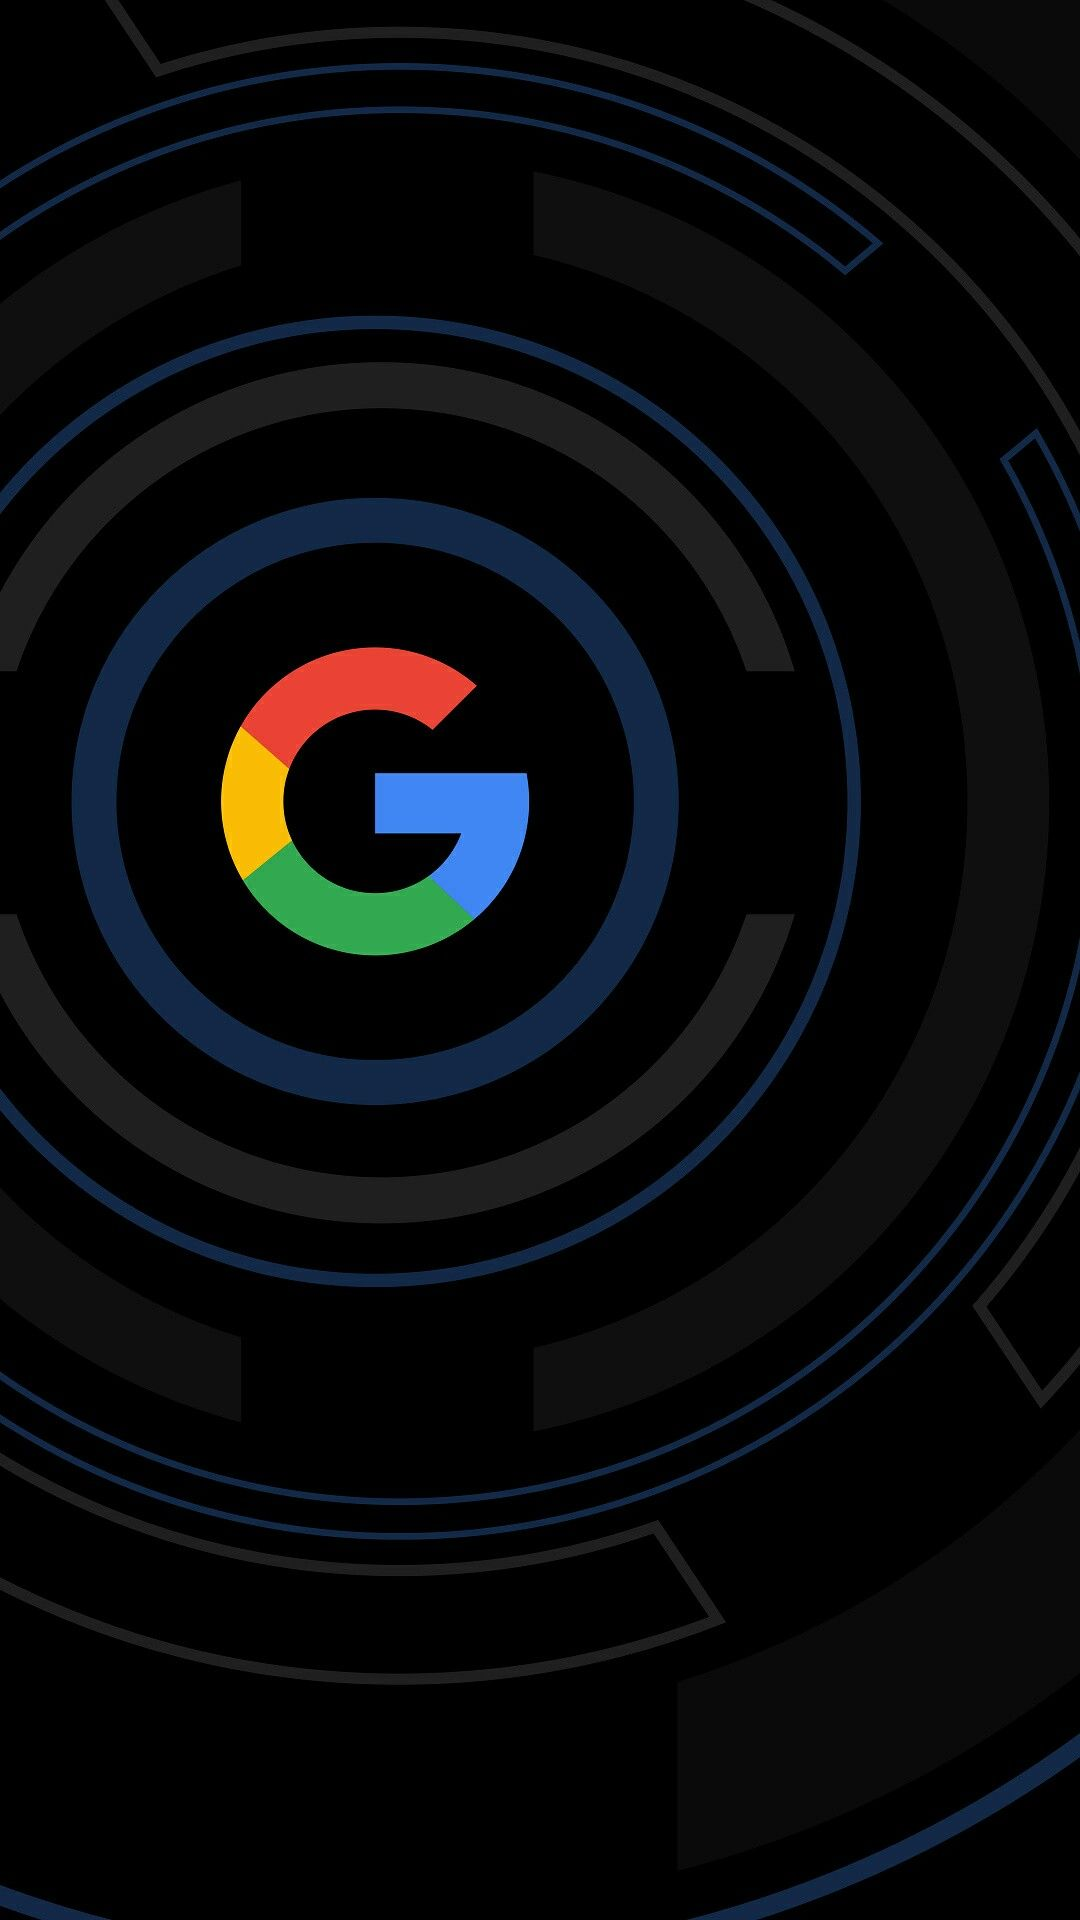 Black Google Wallpaper | *Black Wallpapers in 2019 | Black wallpaper, Iphone wallpaper, S8 wallpaper